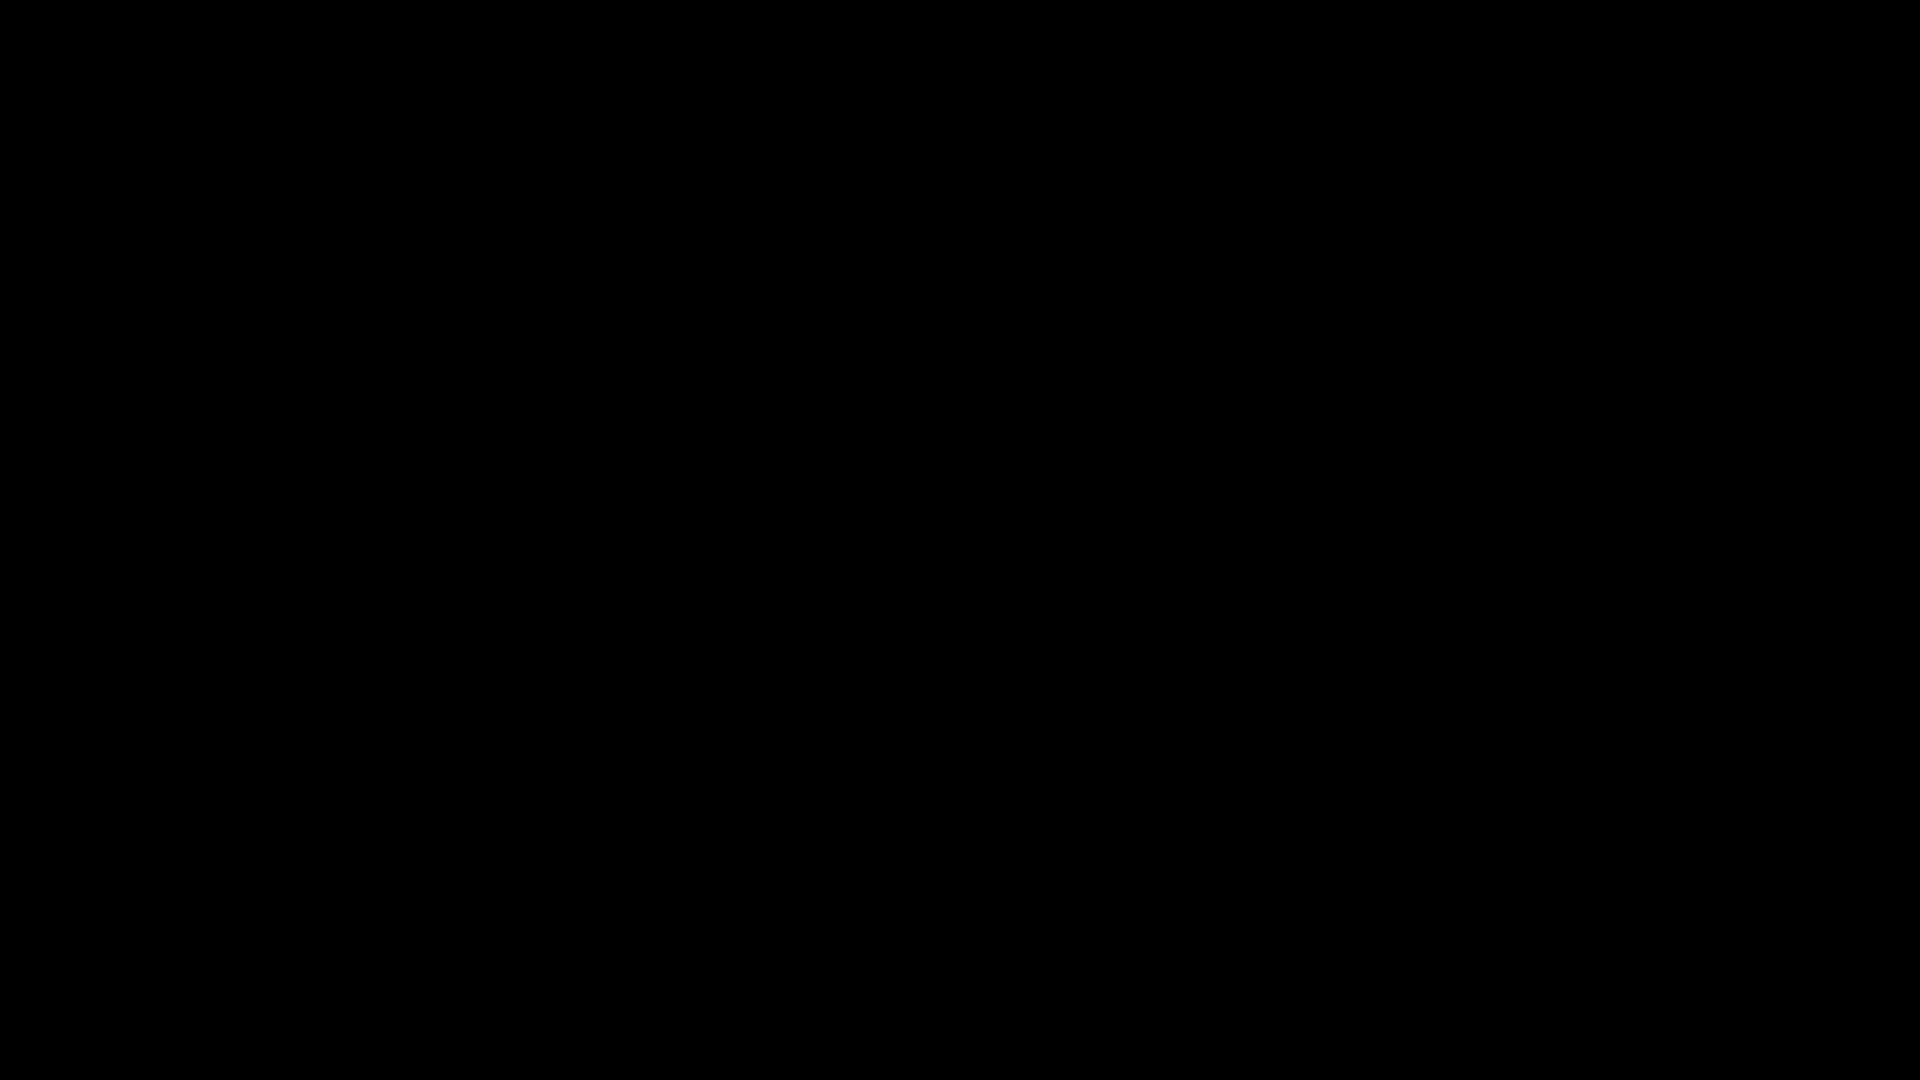 pinkfloydC4d3DText1080pV1 copy by f0xy0k